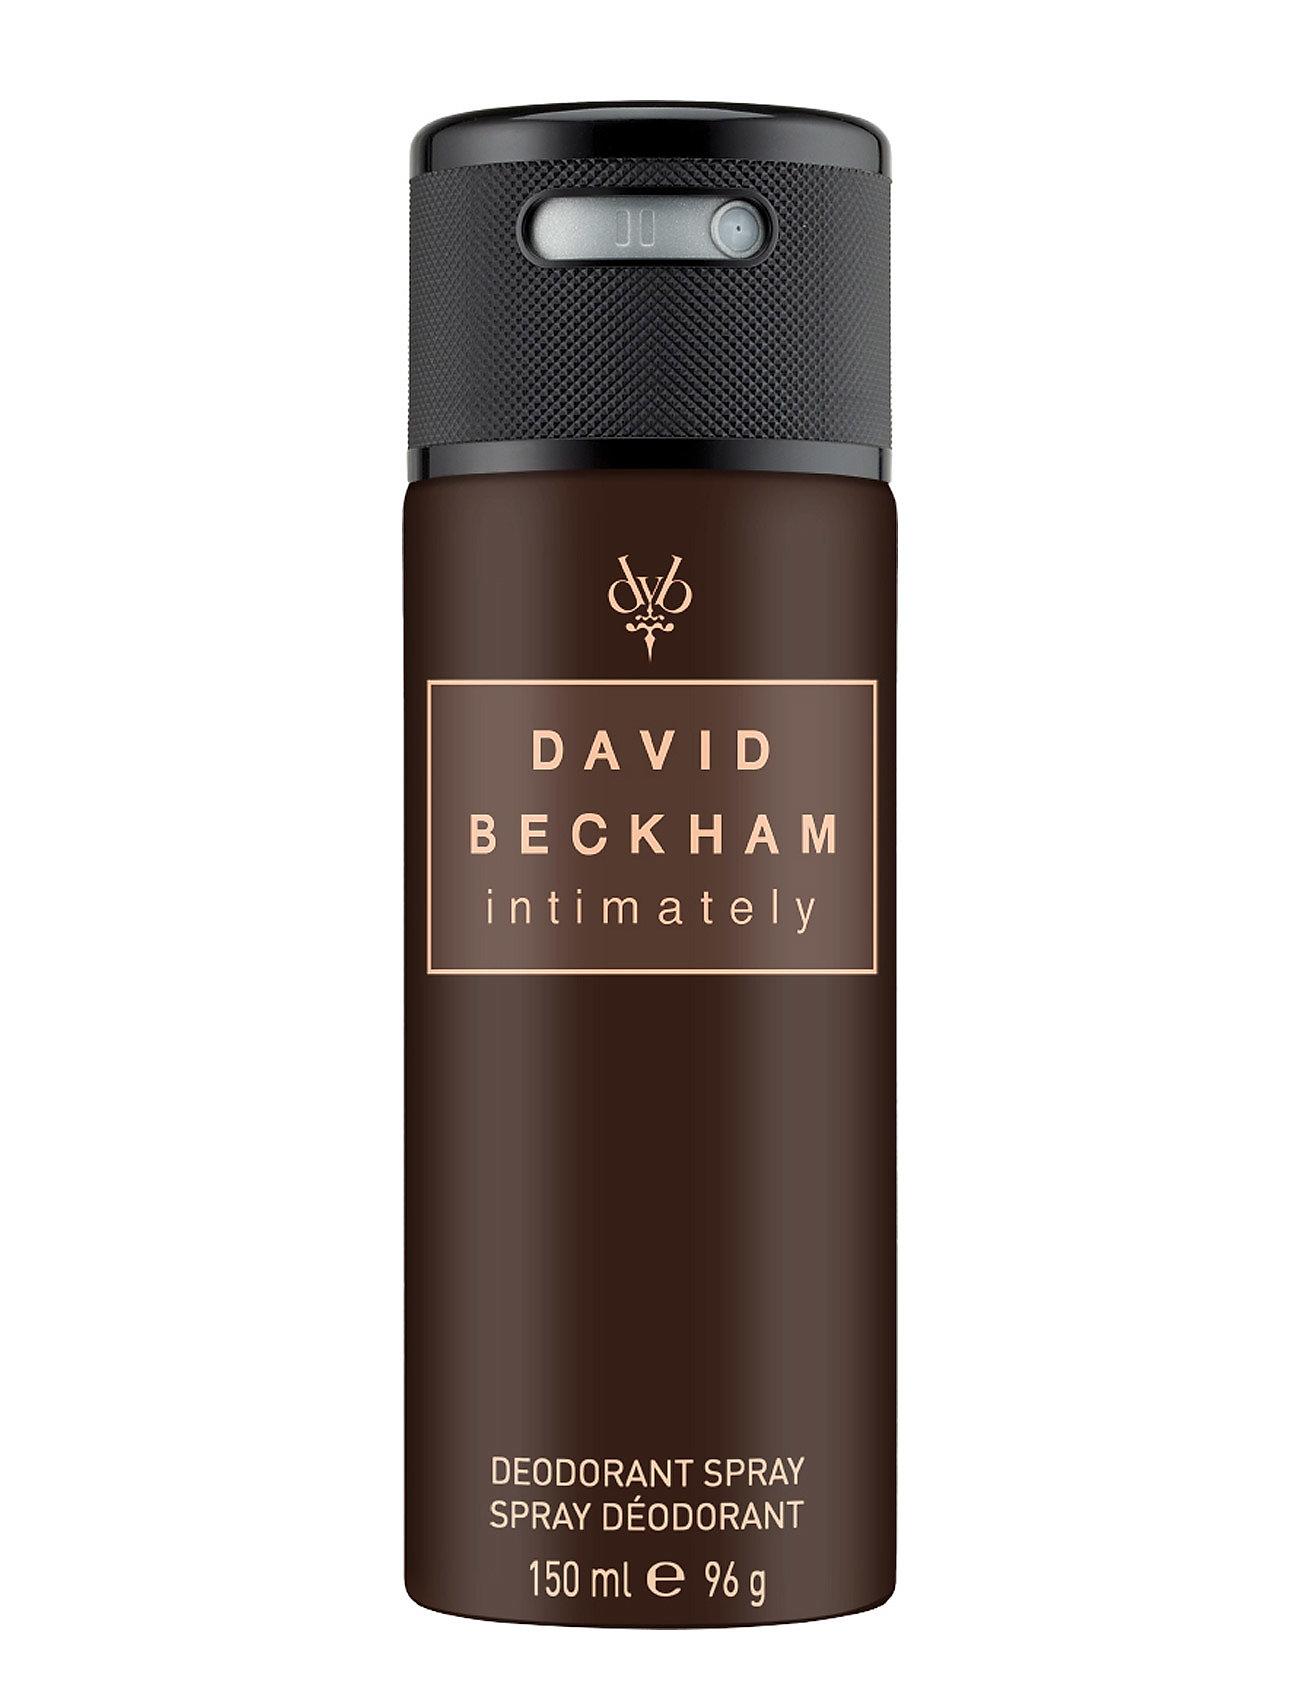 david beckham – David beckham intimately male deodo på boozt.com dk